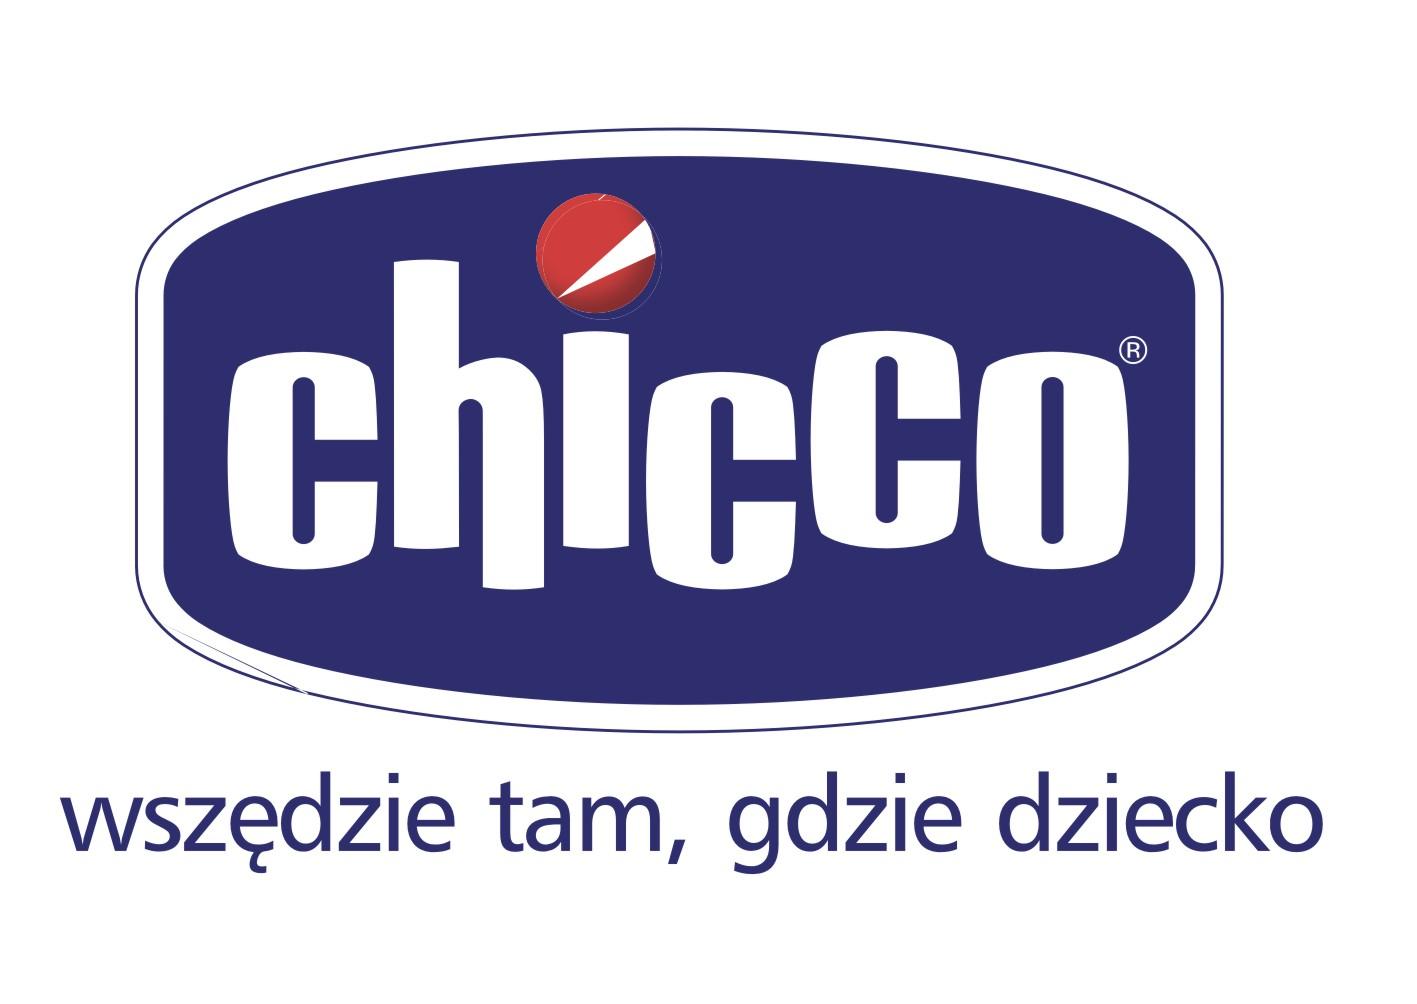 chiccosmall